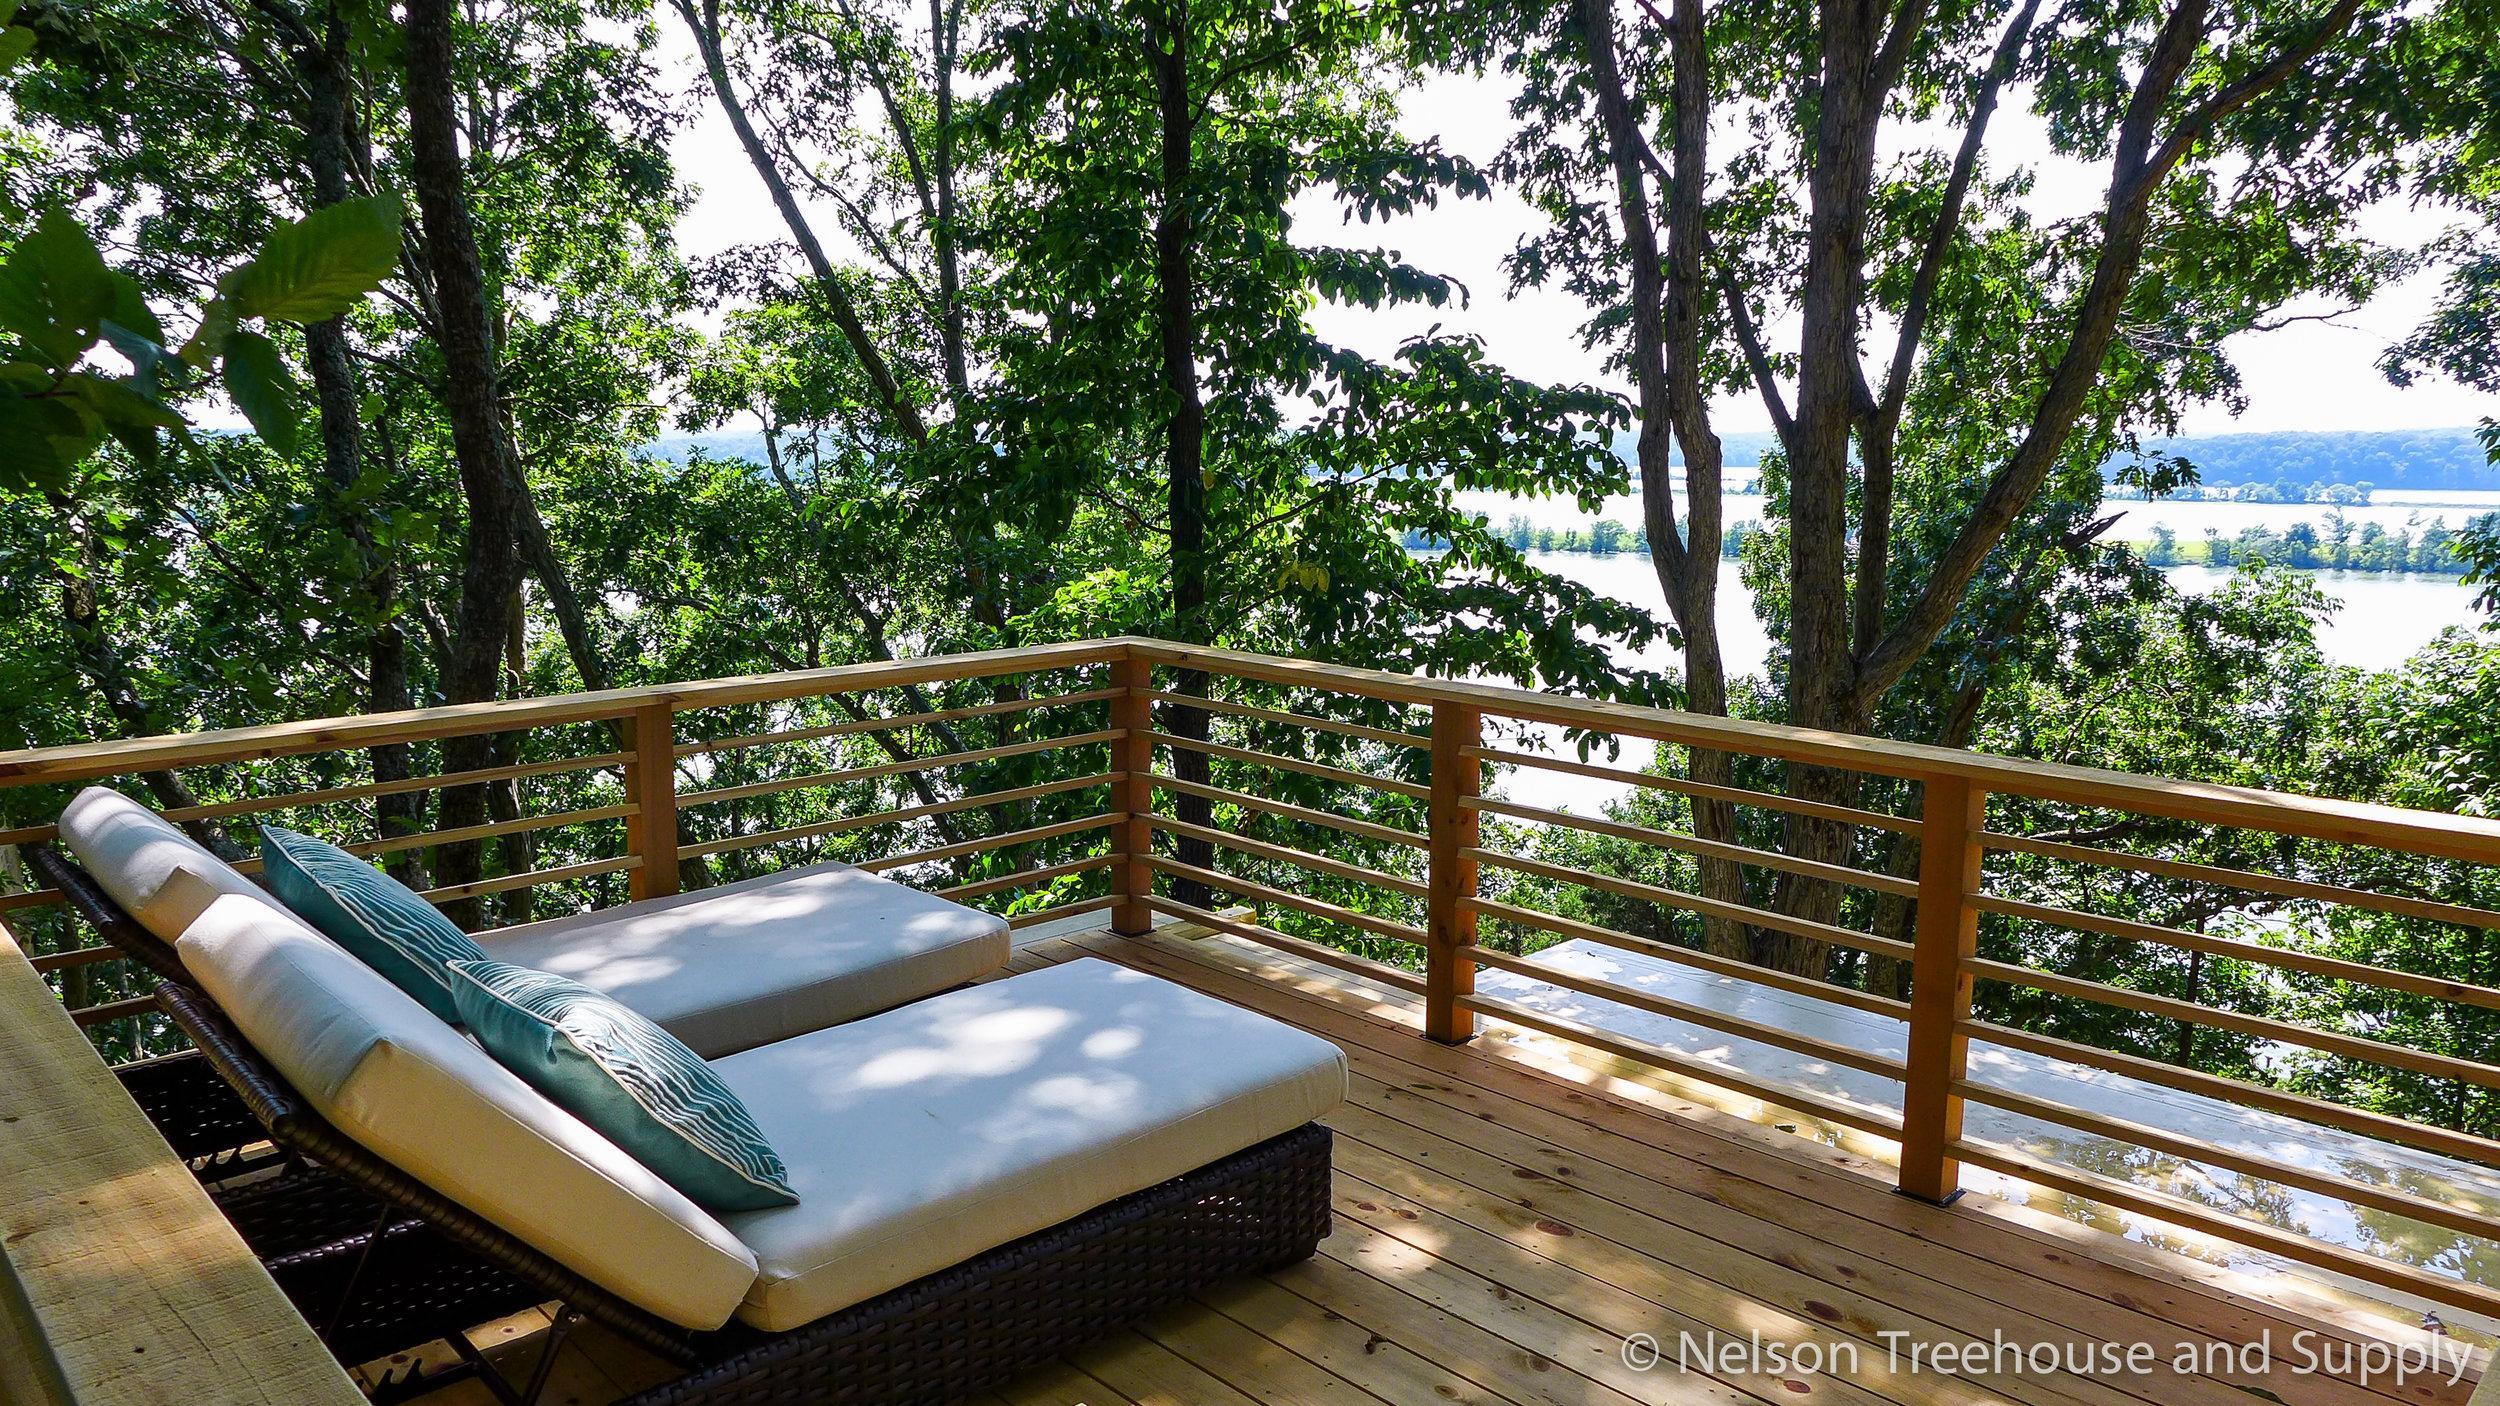 frank-lloyd-wright-treehouse-sun-roof-view